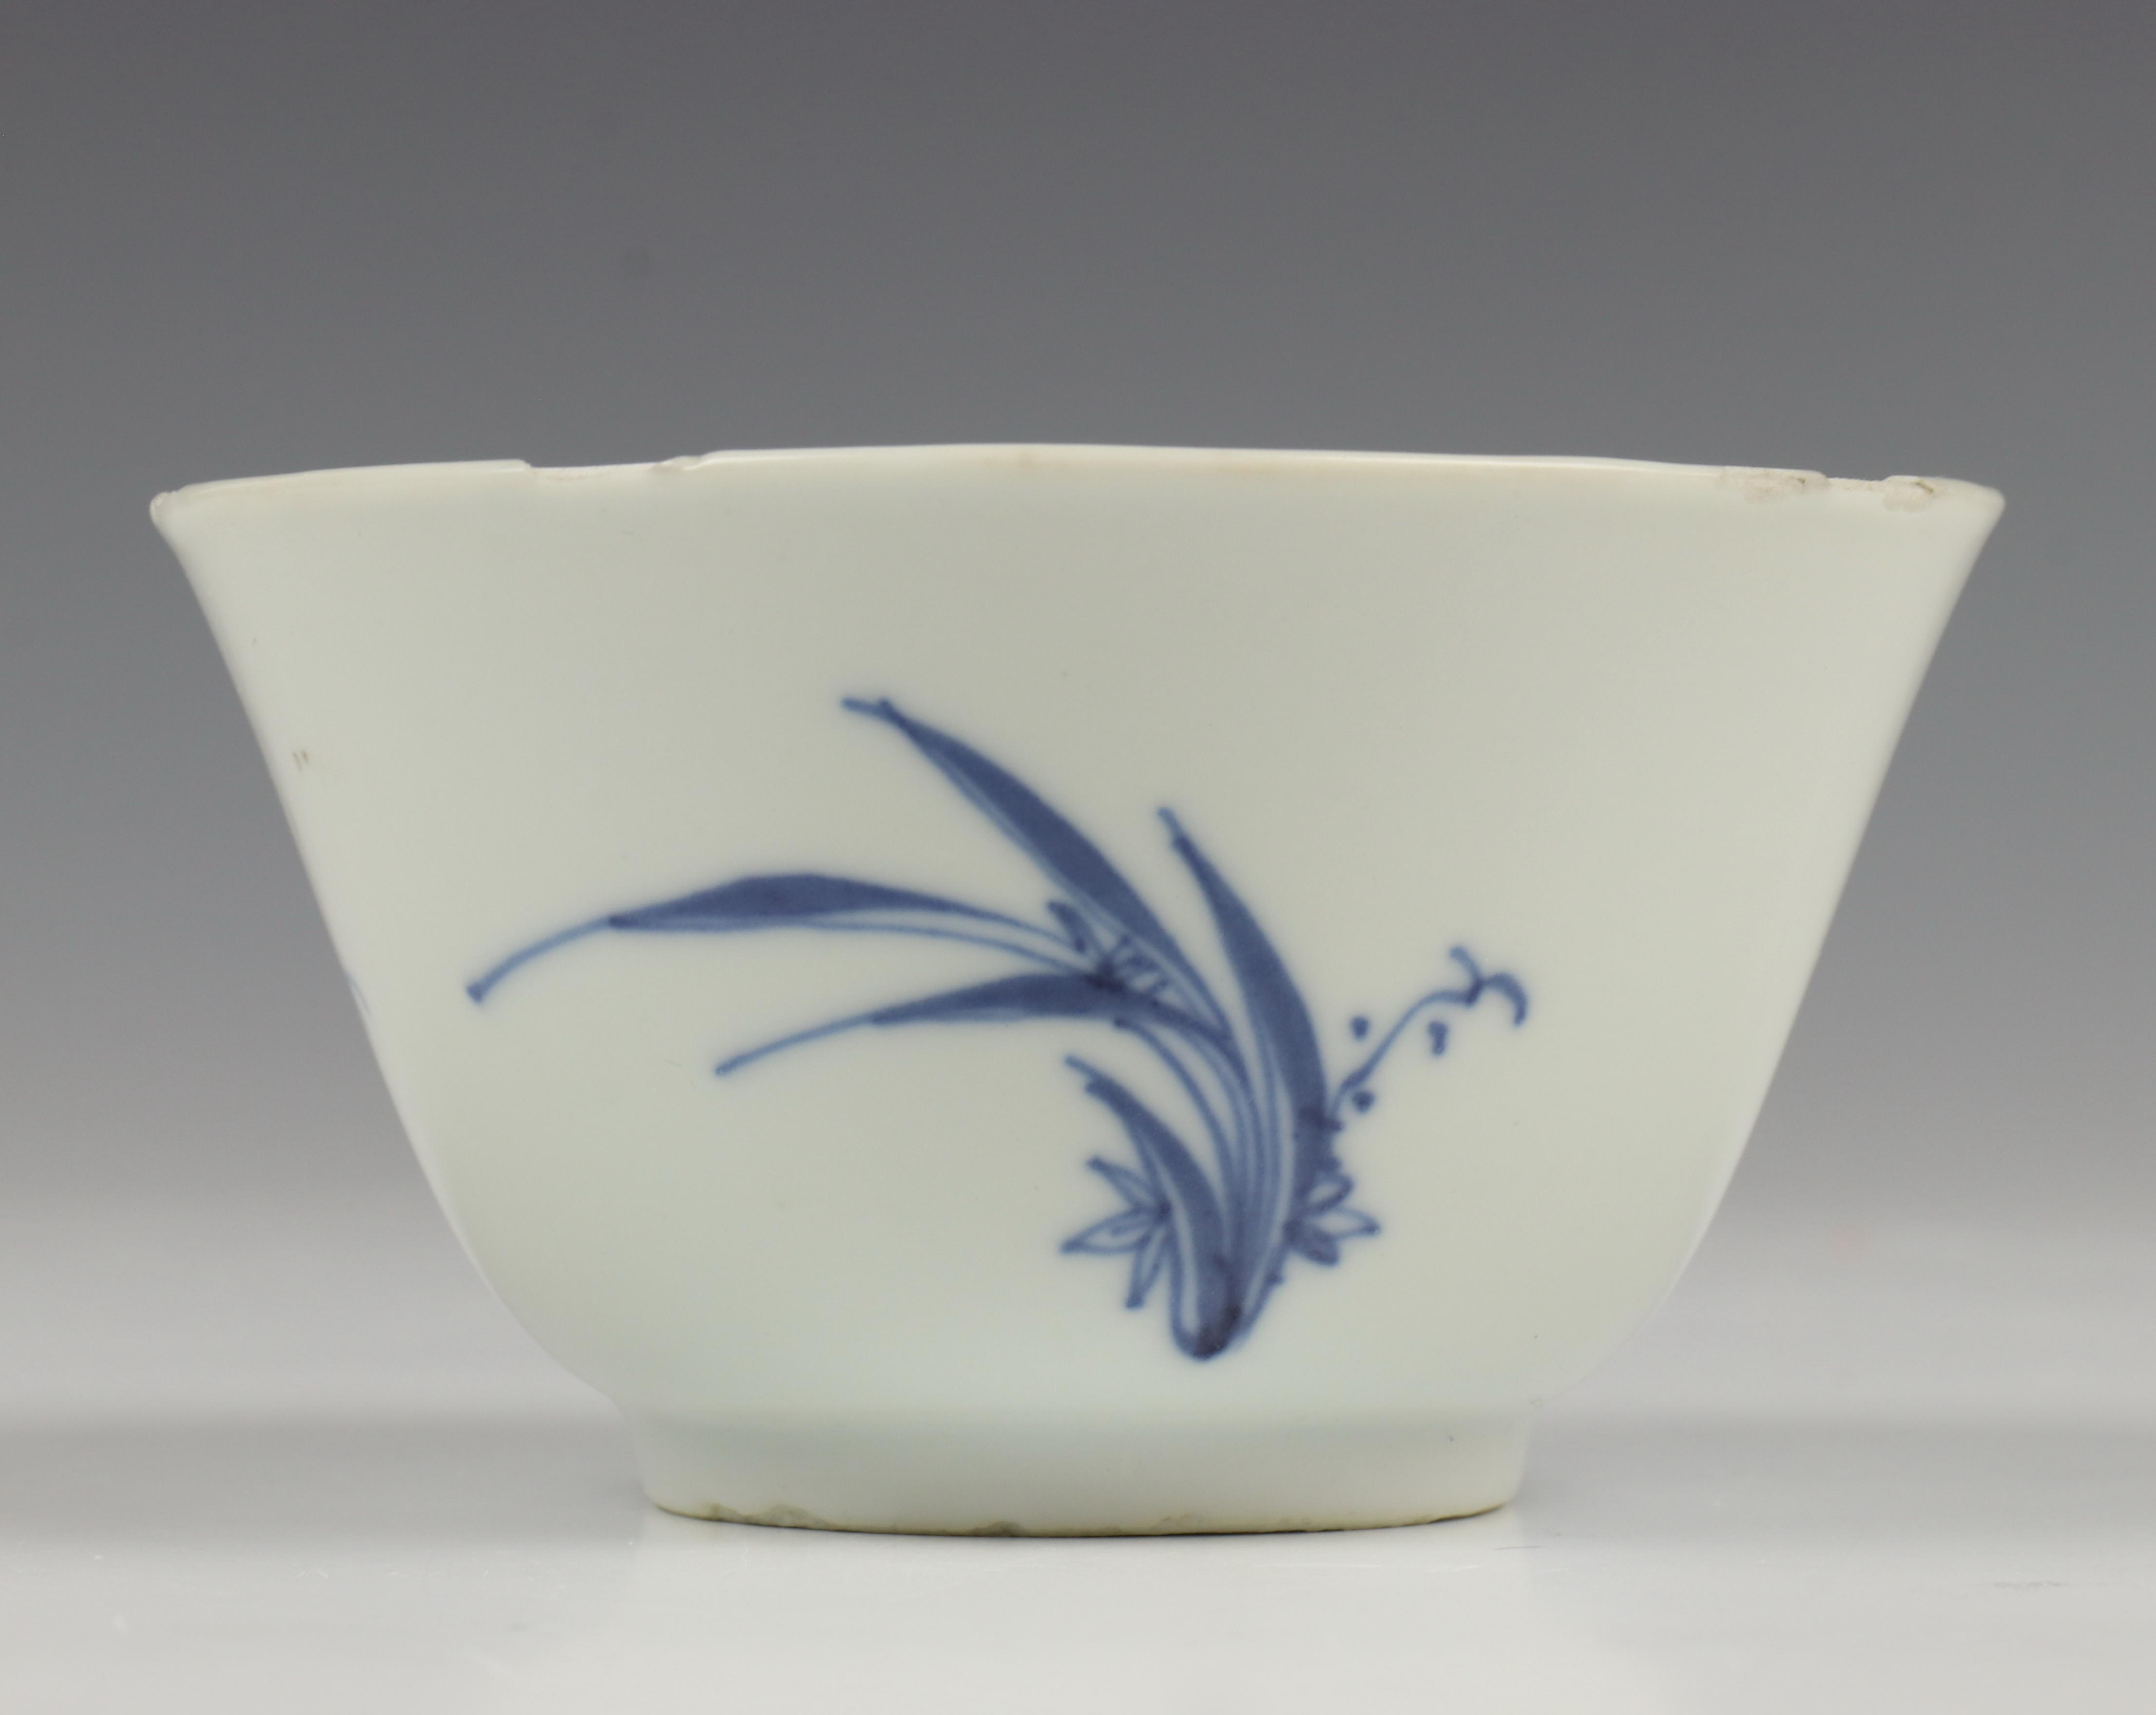 China, blauw wit porsleinen kopje, Ming/Transitional - Image 9 of 11